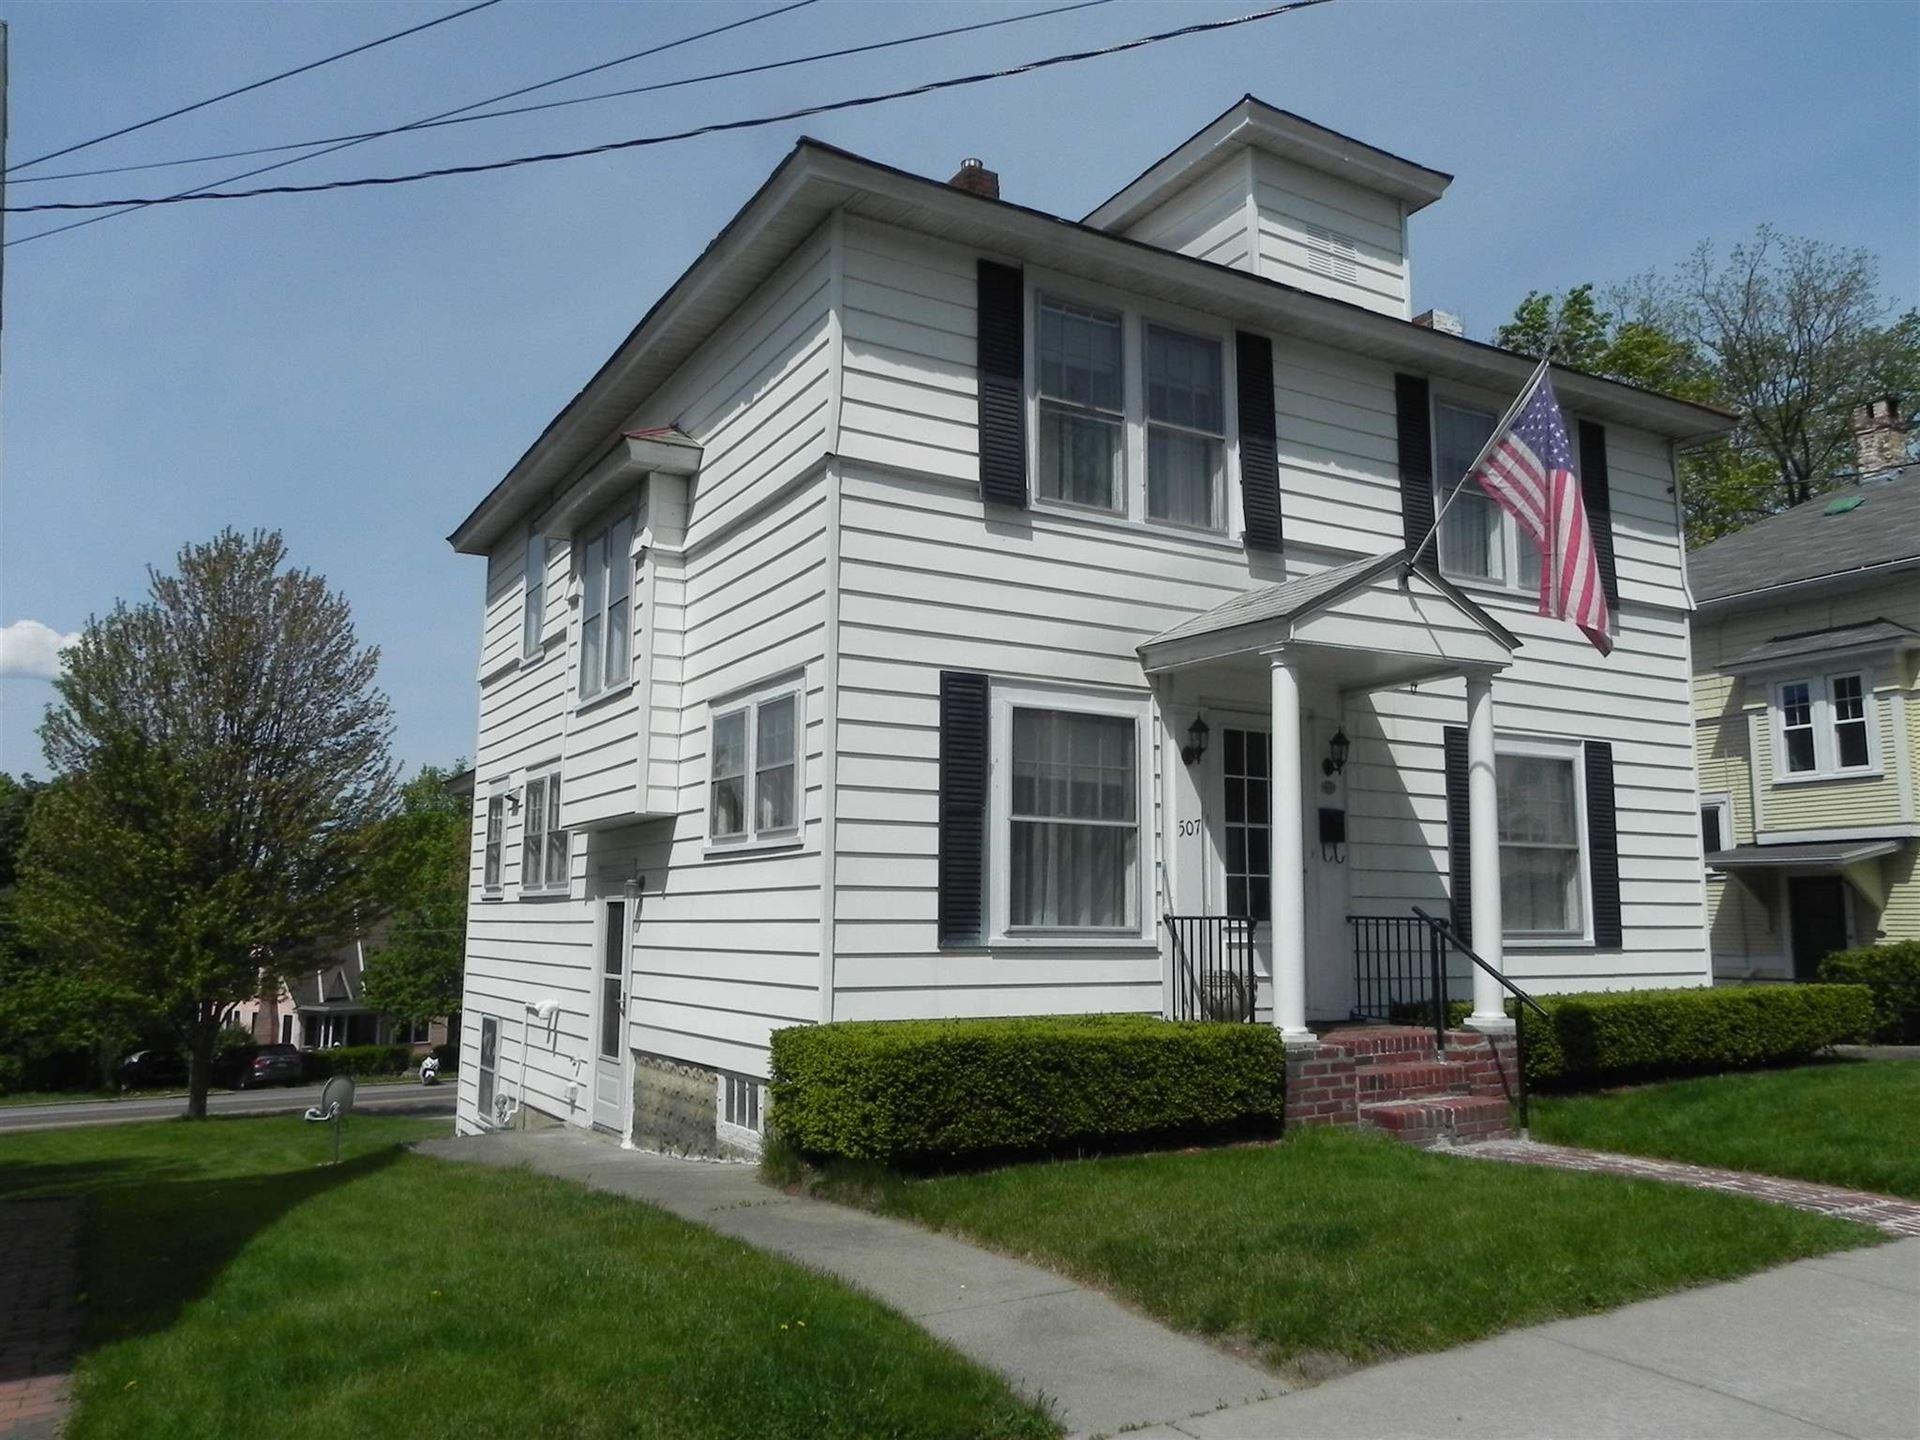 507 South Union Street, Burlington, VT 05401 - MLS#: 4861293